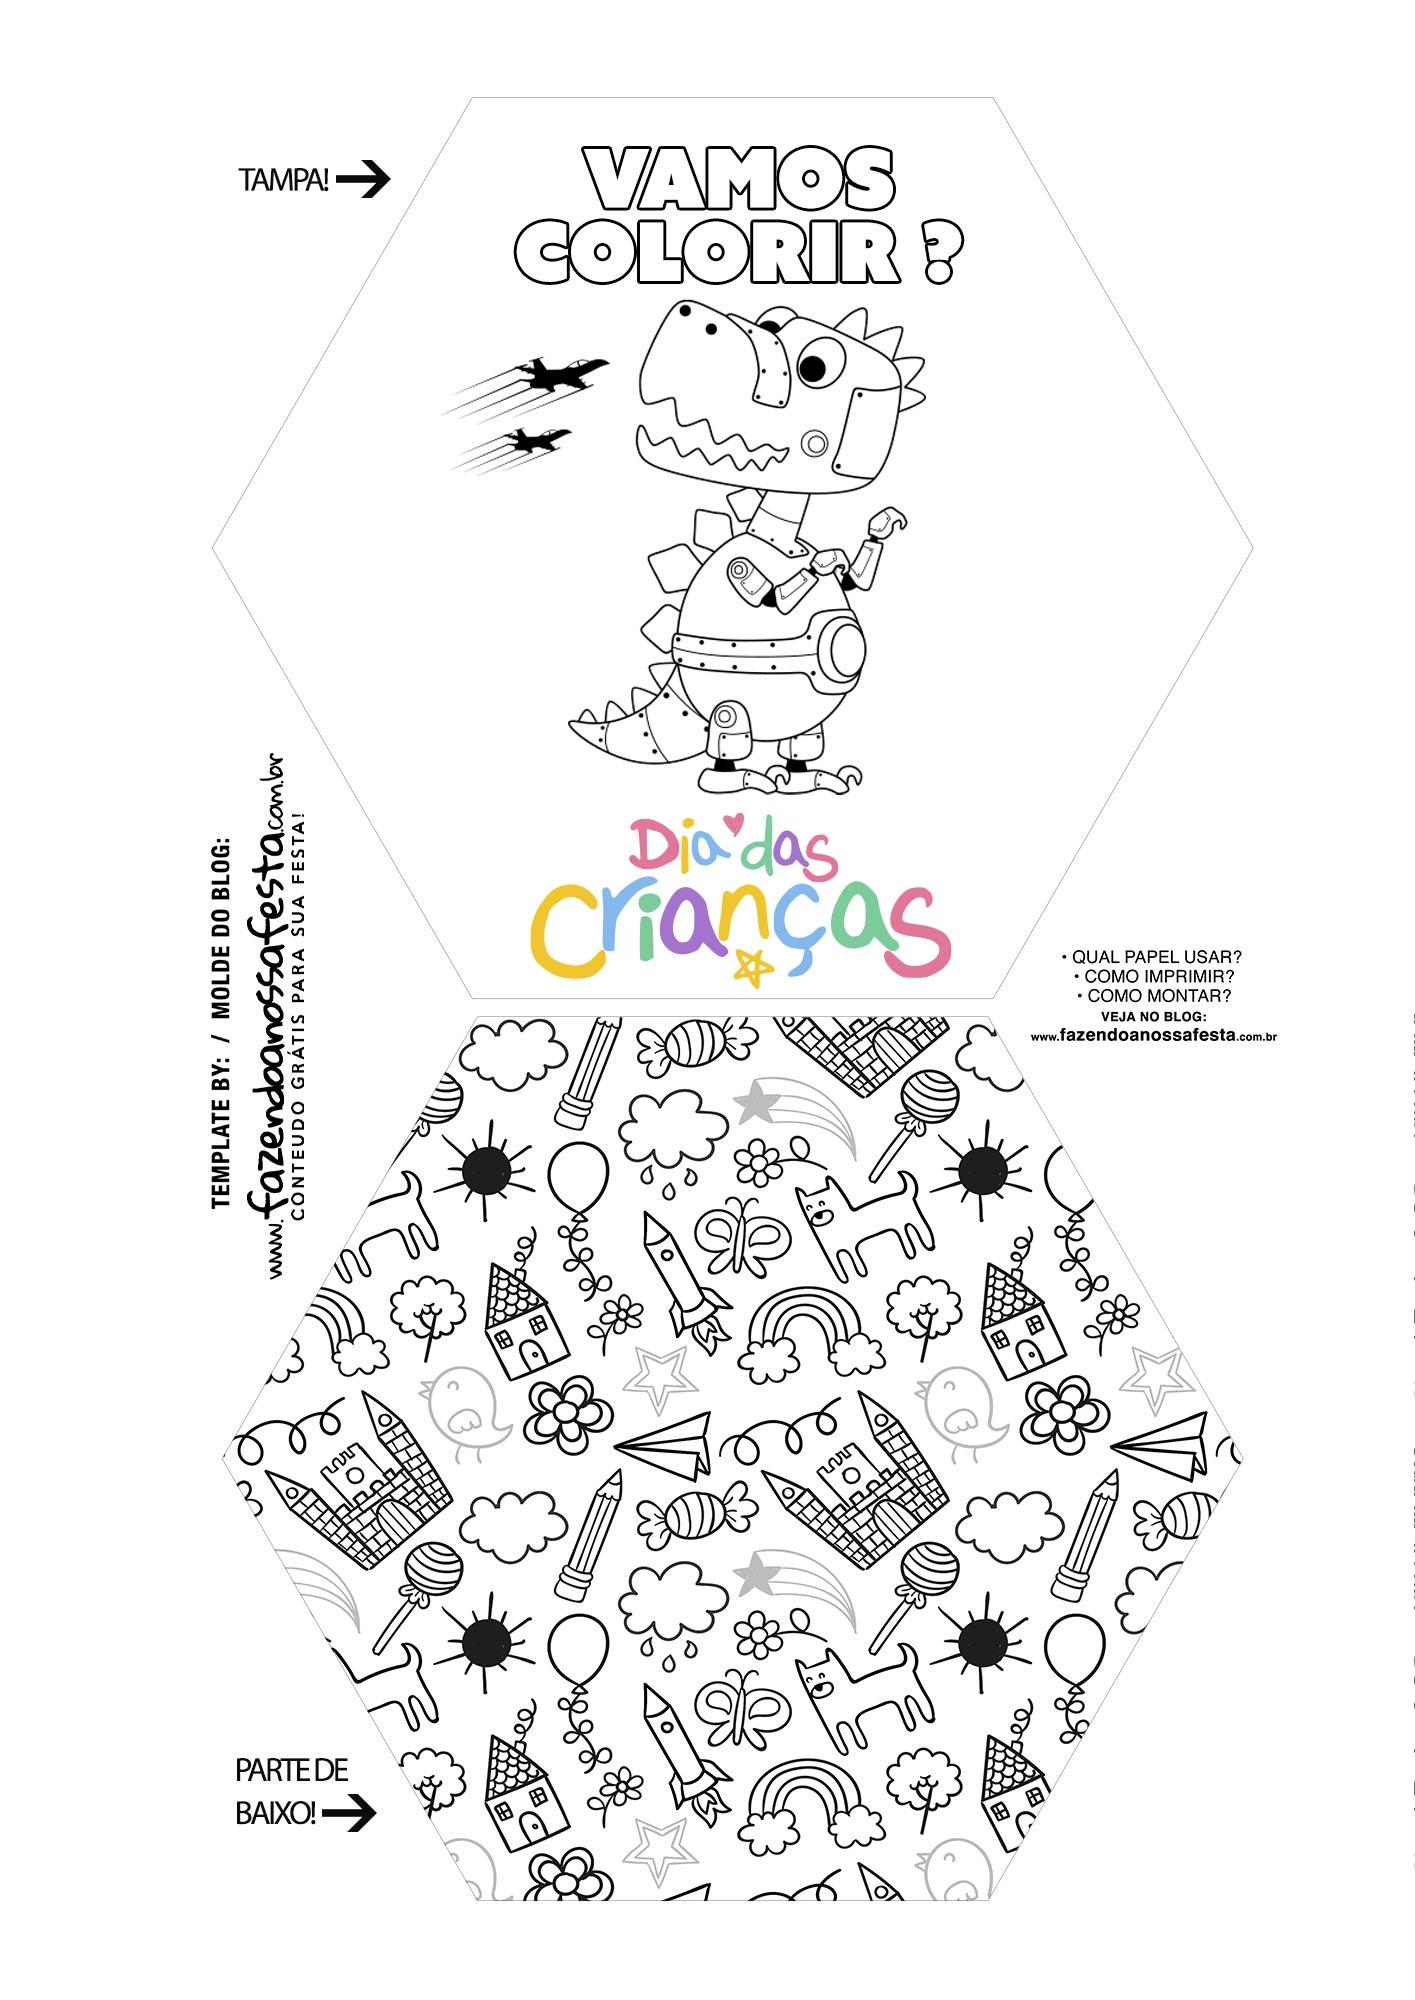 Caixa Explosiva Dia das Criancas para colorir 1